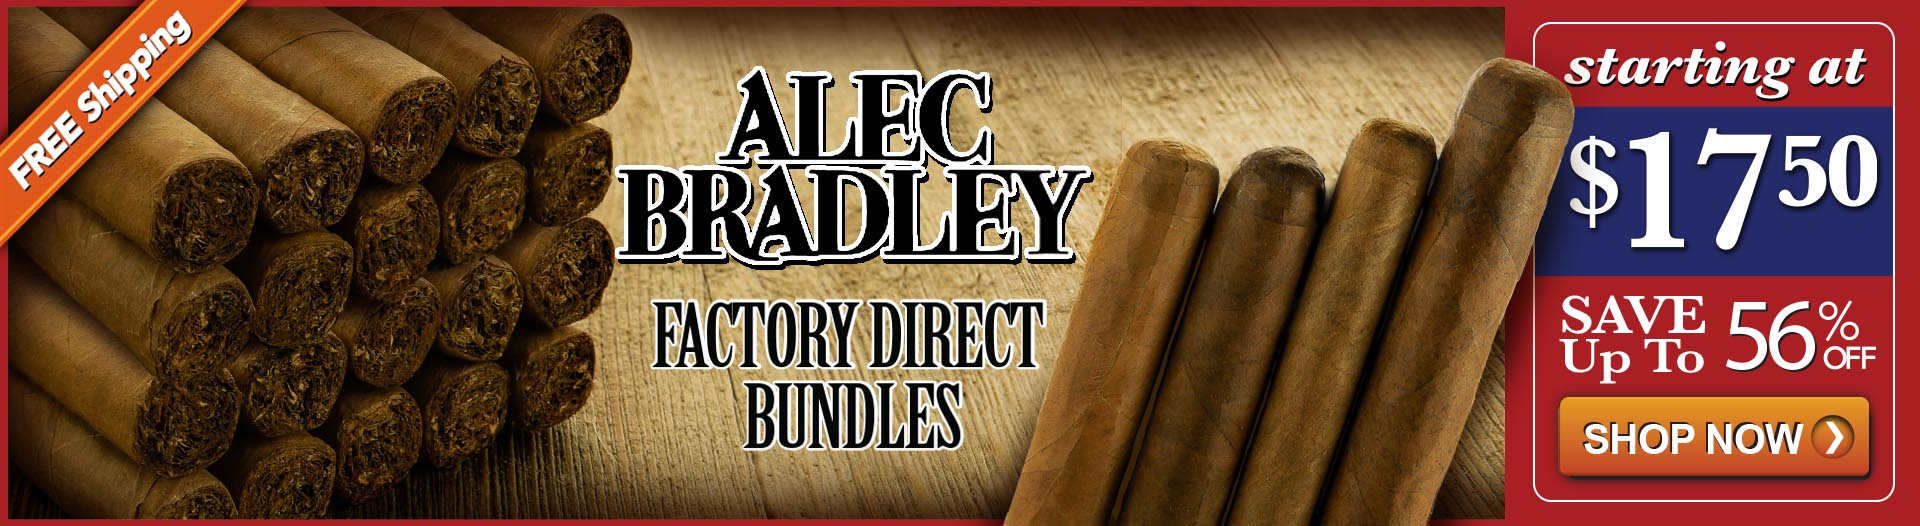 Alec Bradley Factory Seconds